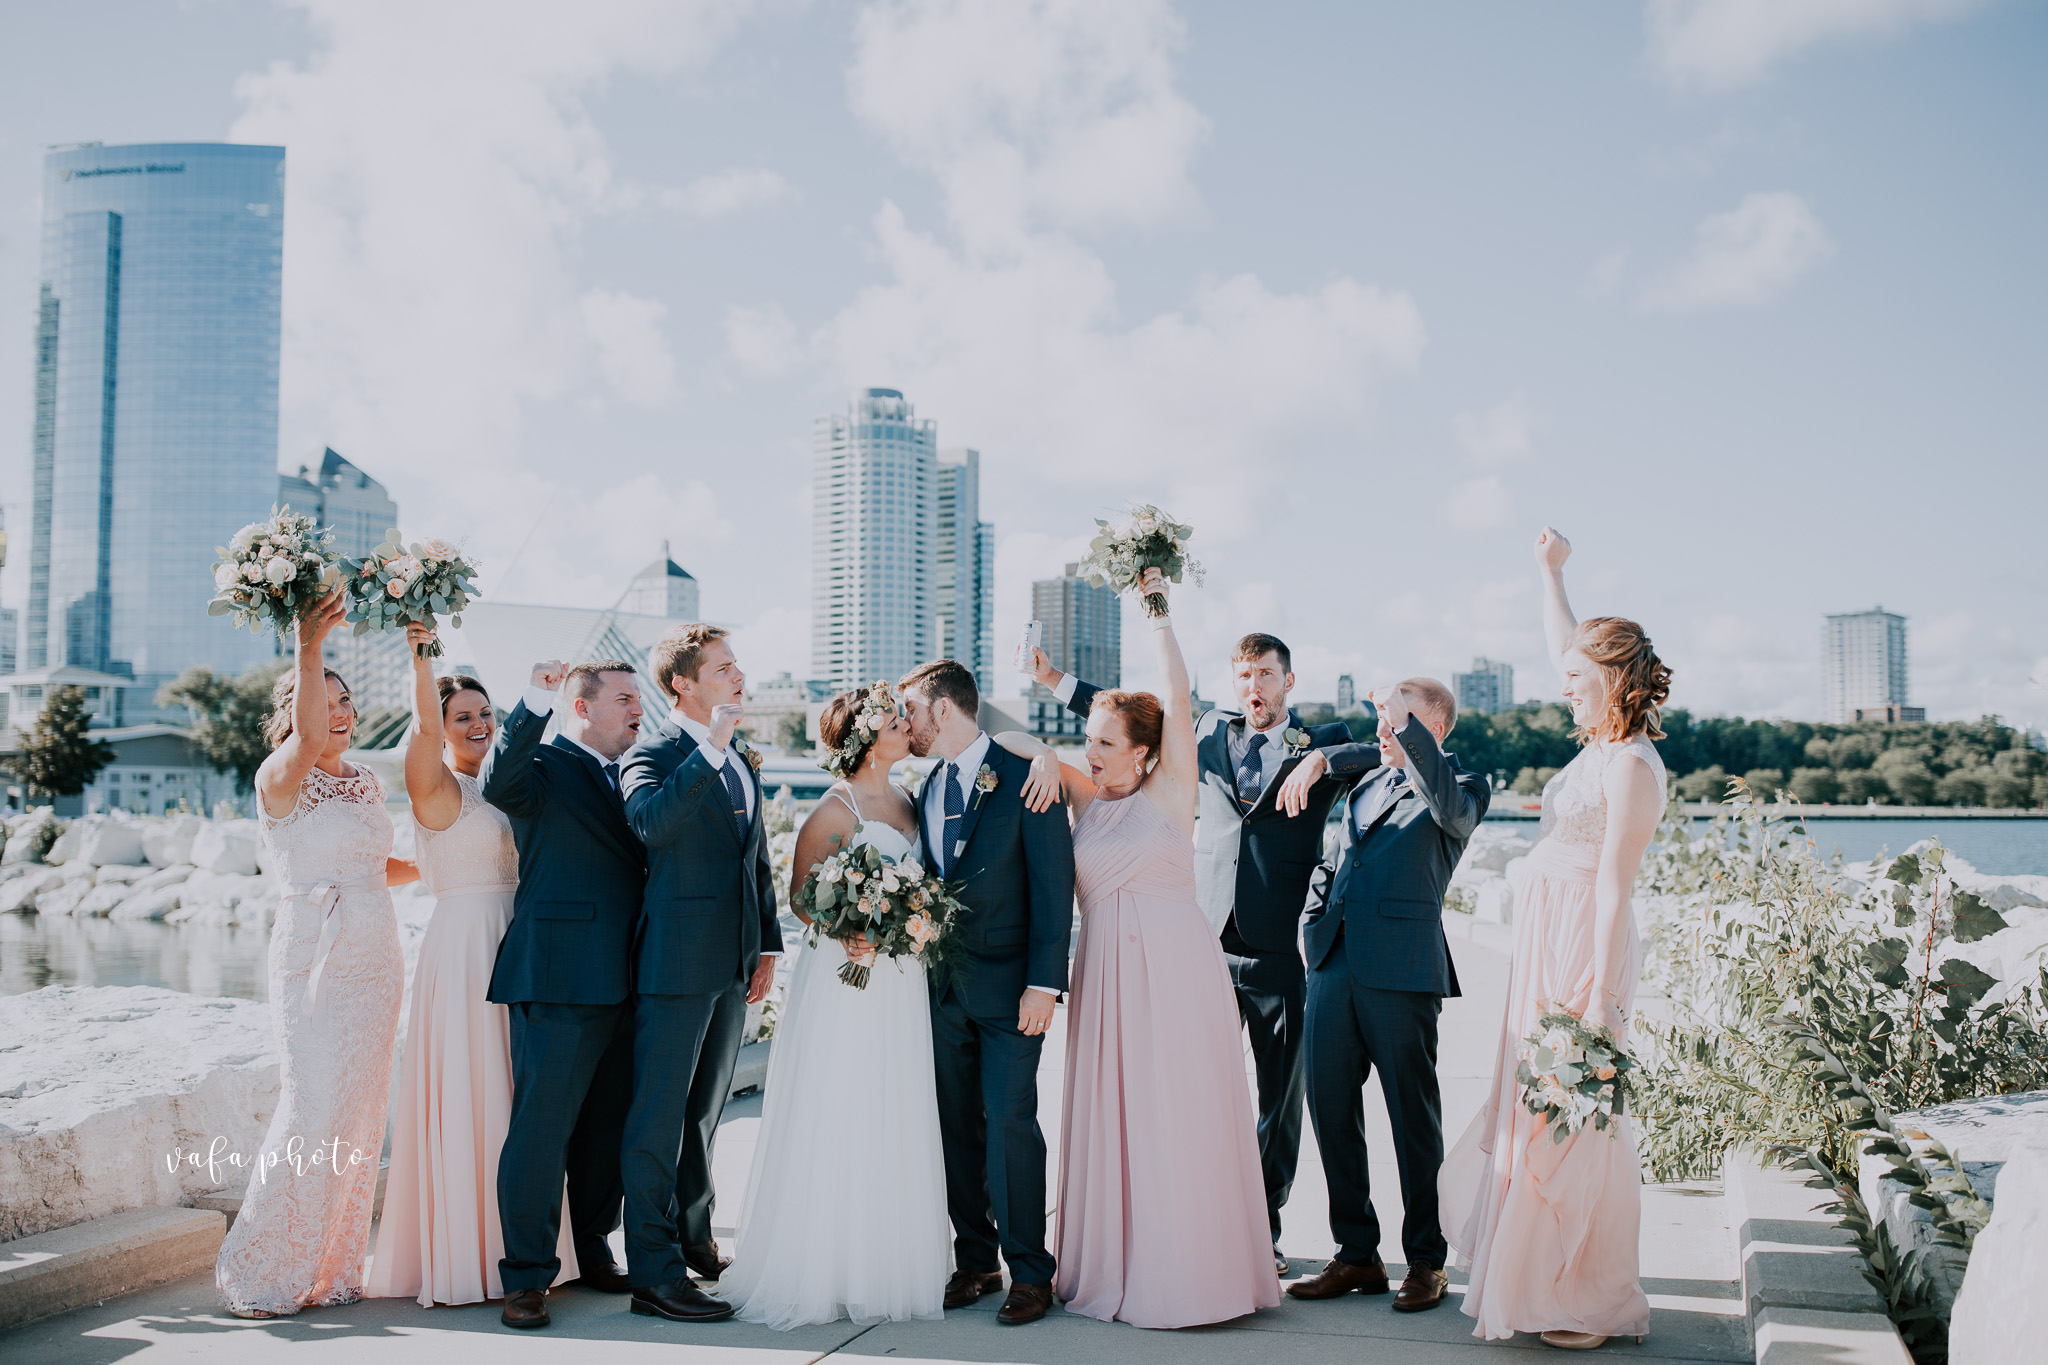 Milwaukee-Athletic-Club-Wedding-Amanda-Tony-Vafa-Photo-567.jpg